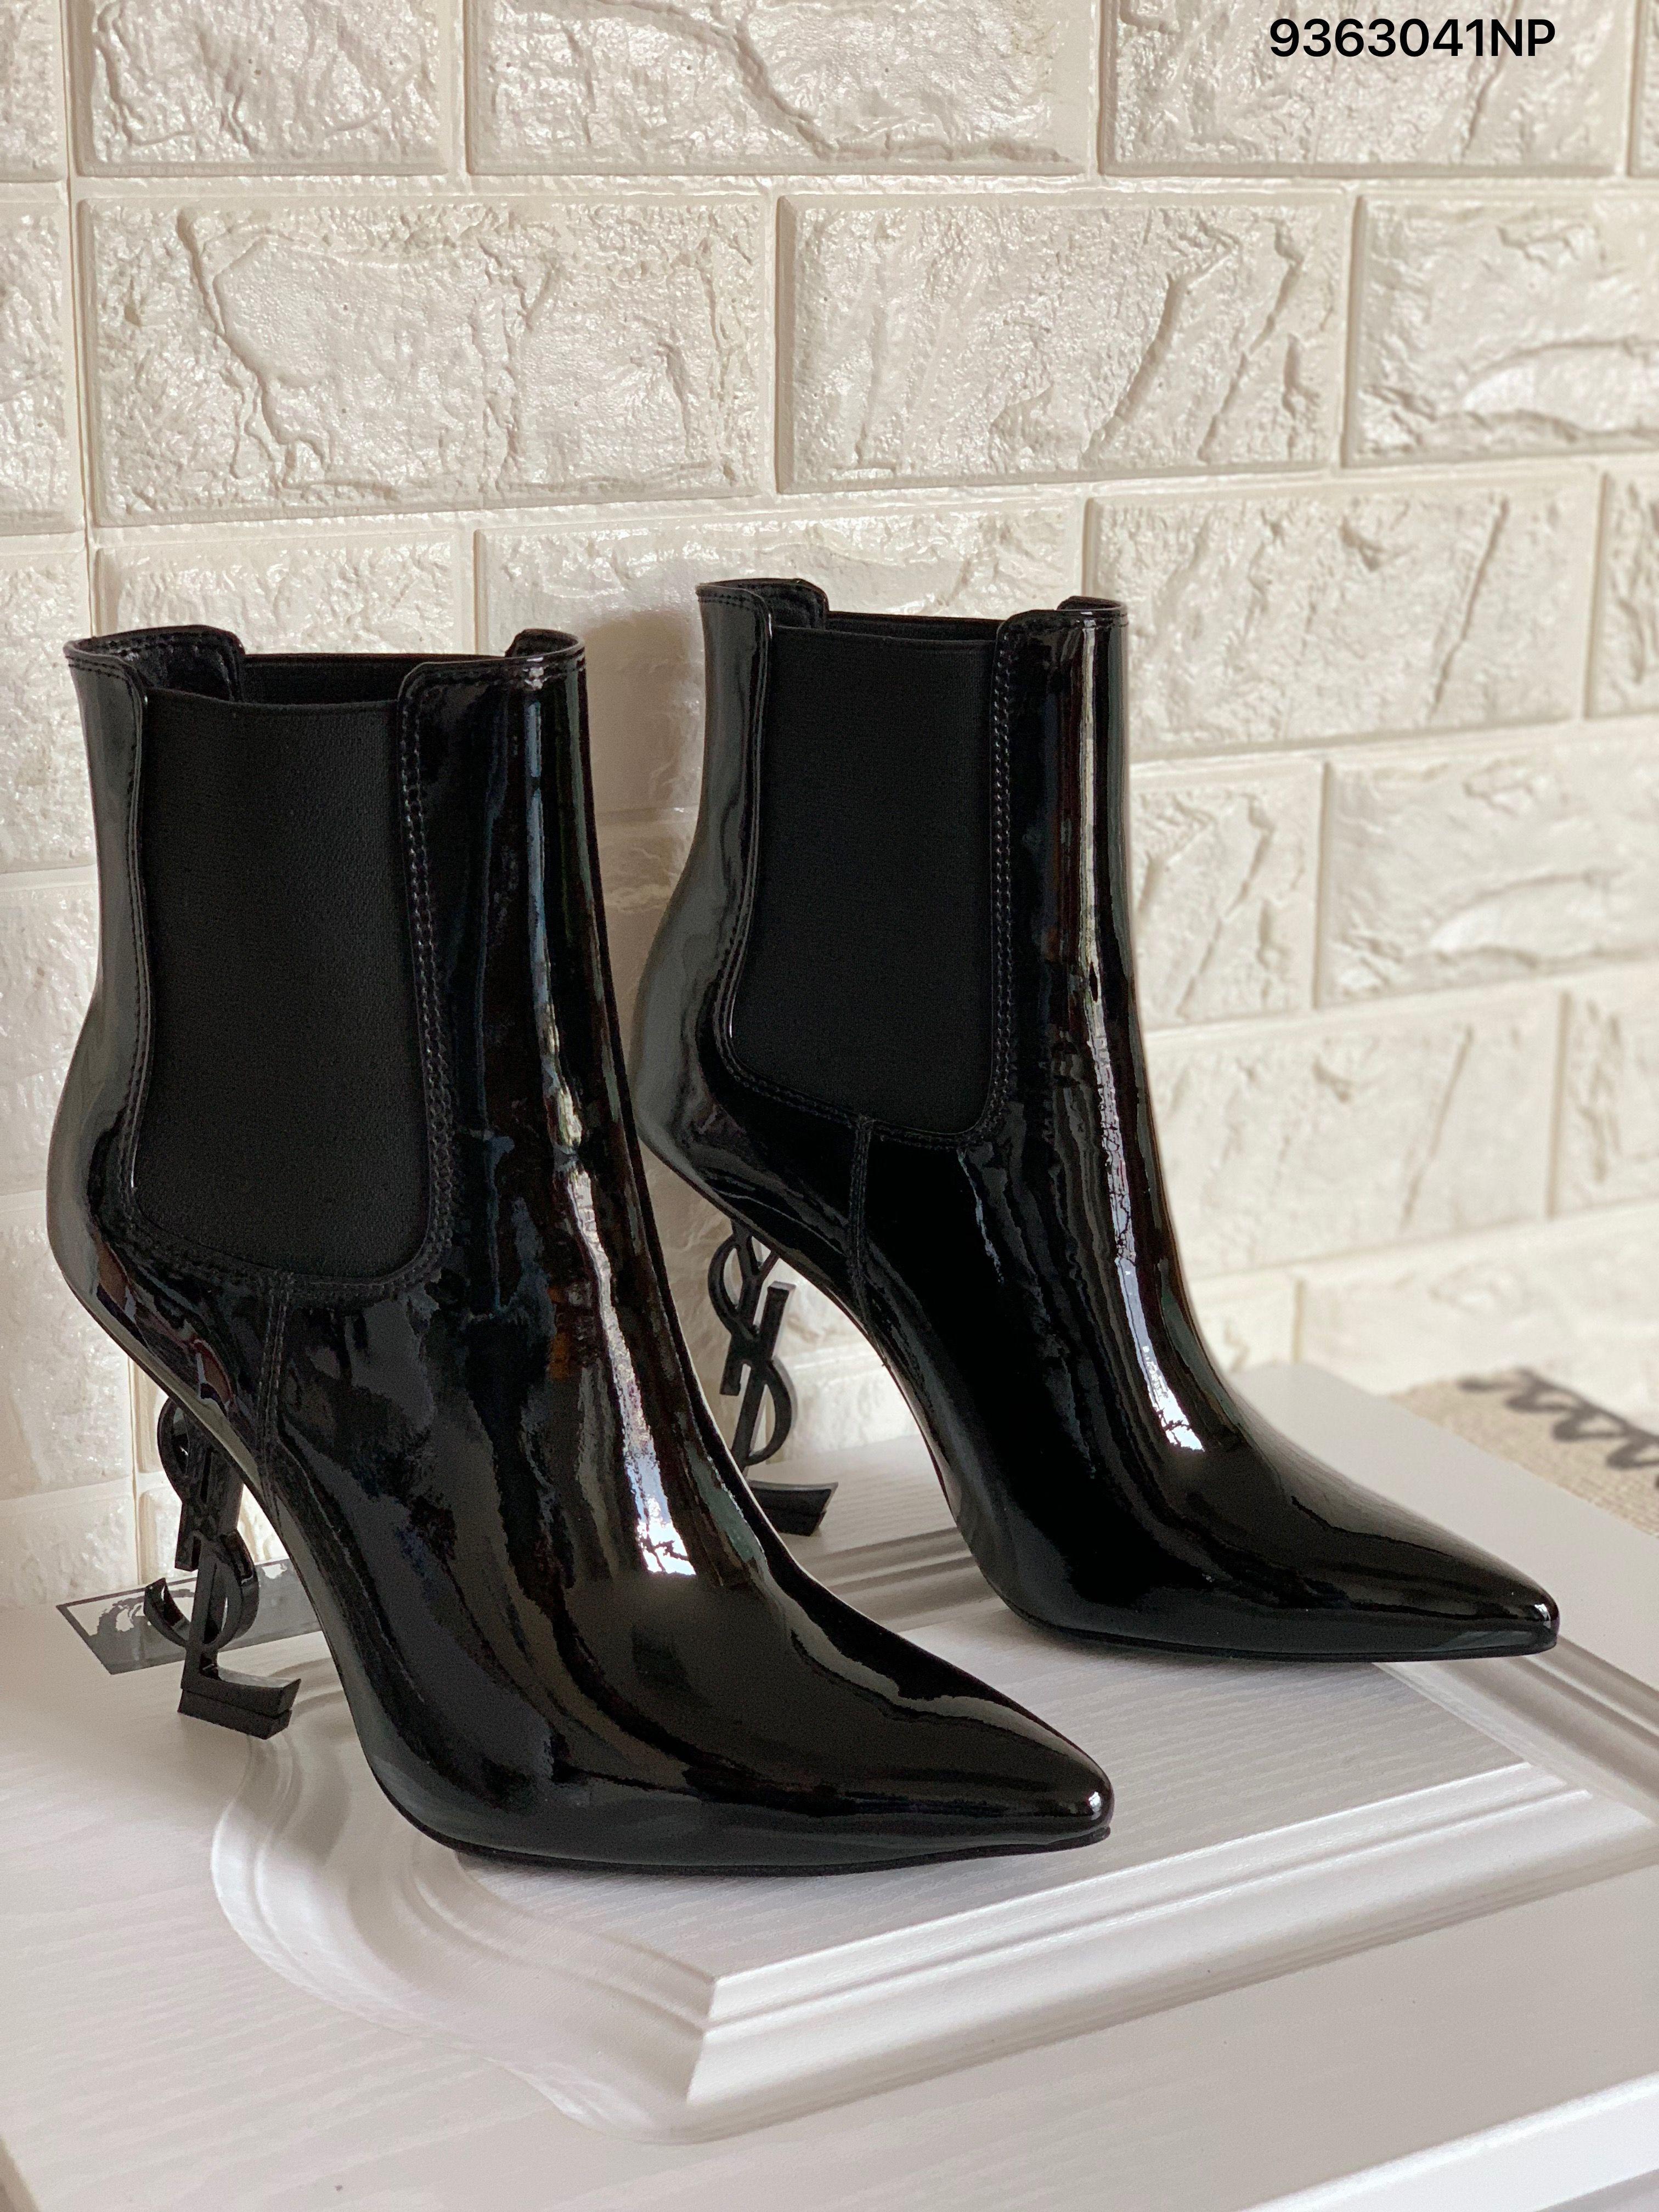 507b786cd9f Ysl Saint Laurent letters heels ankle boots shiny patent leather black